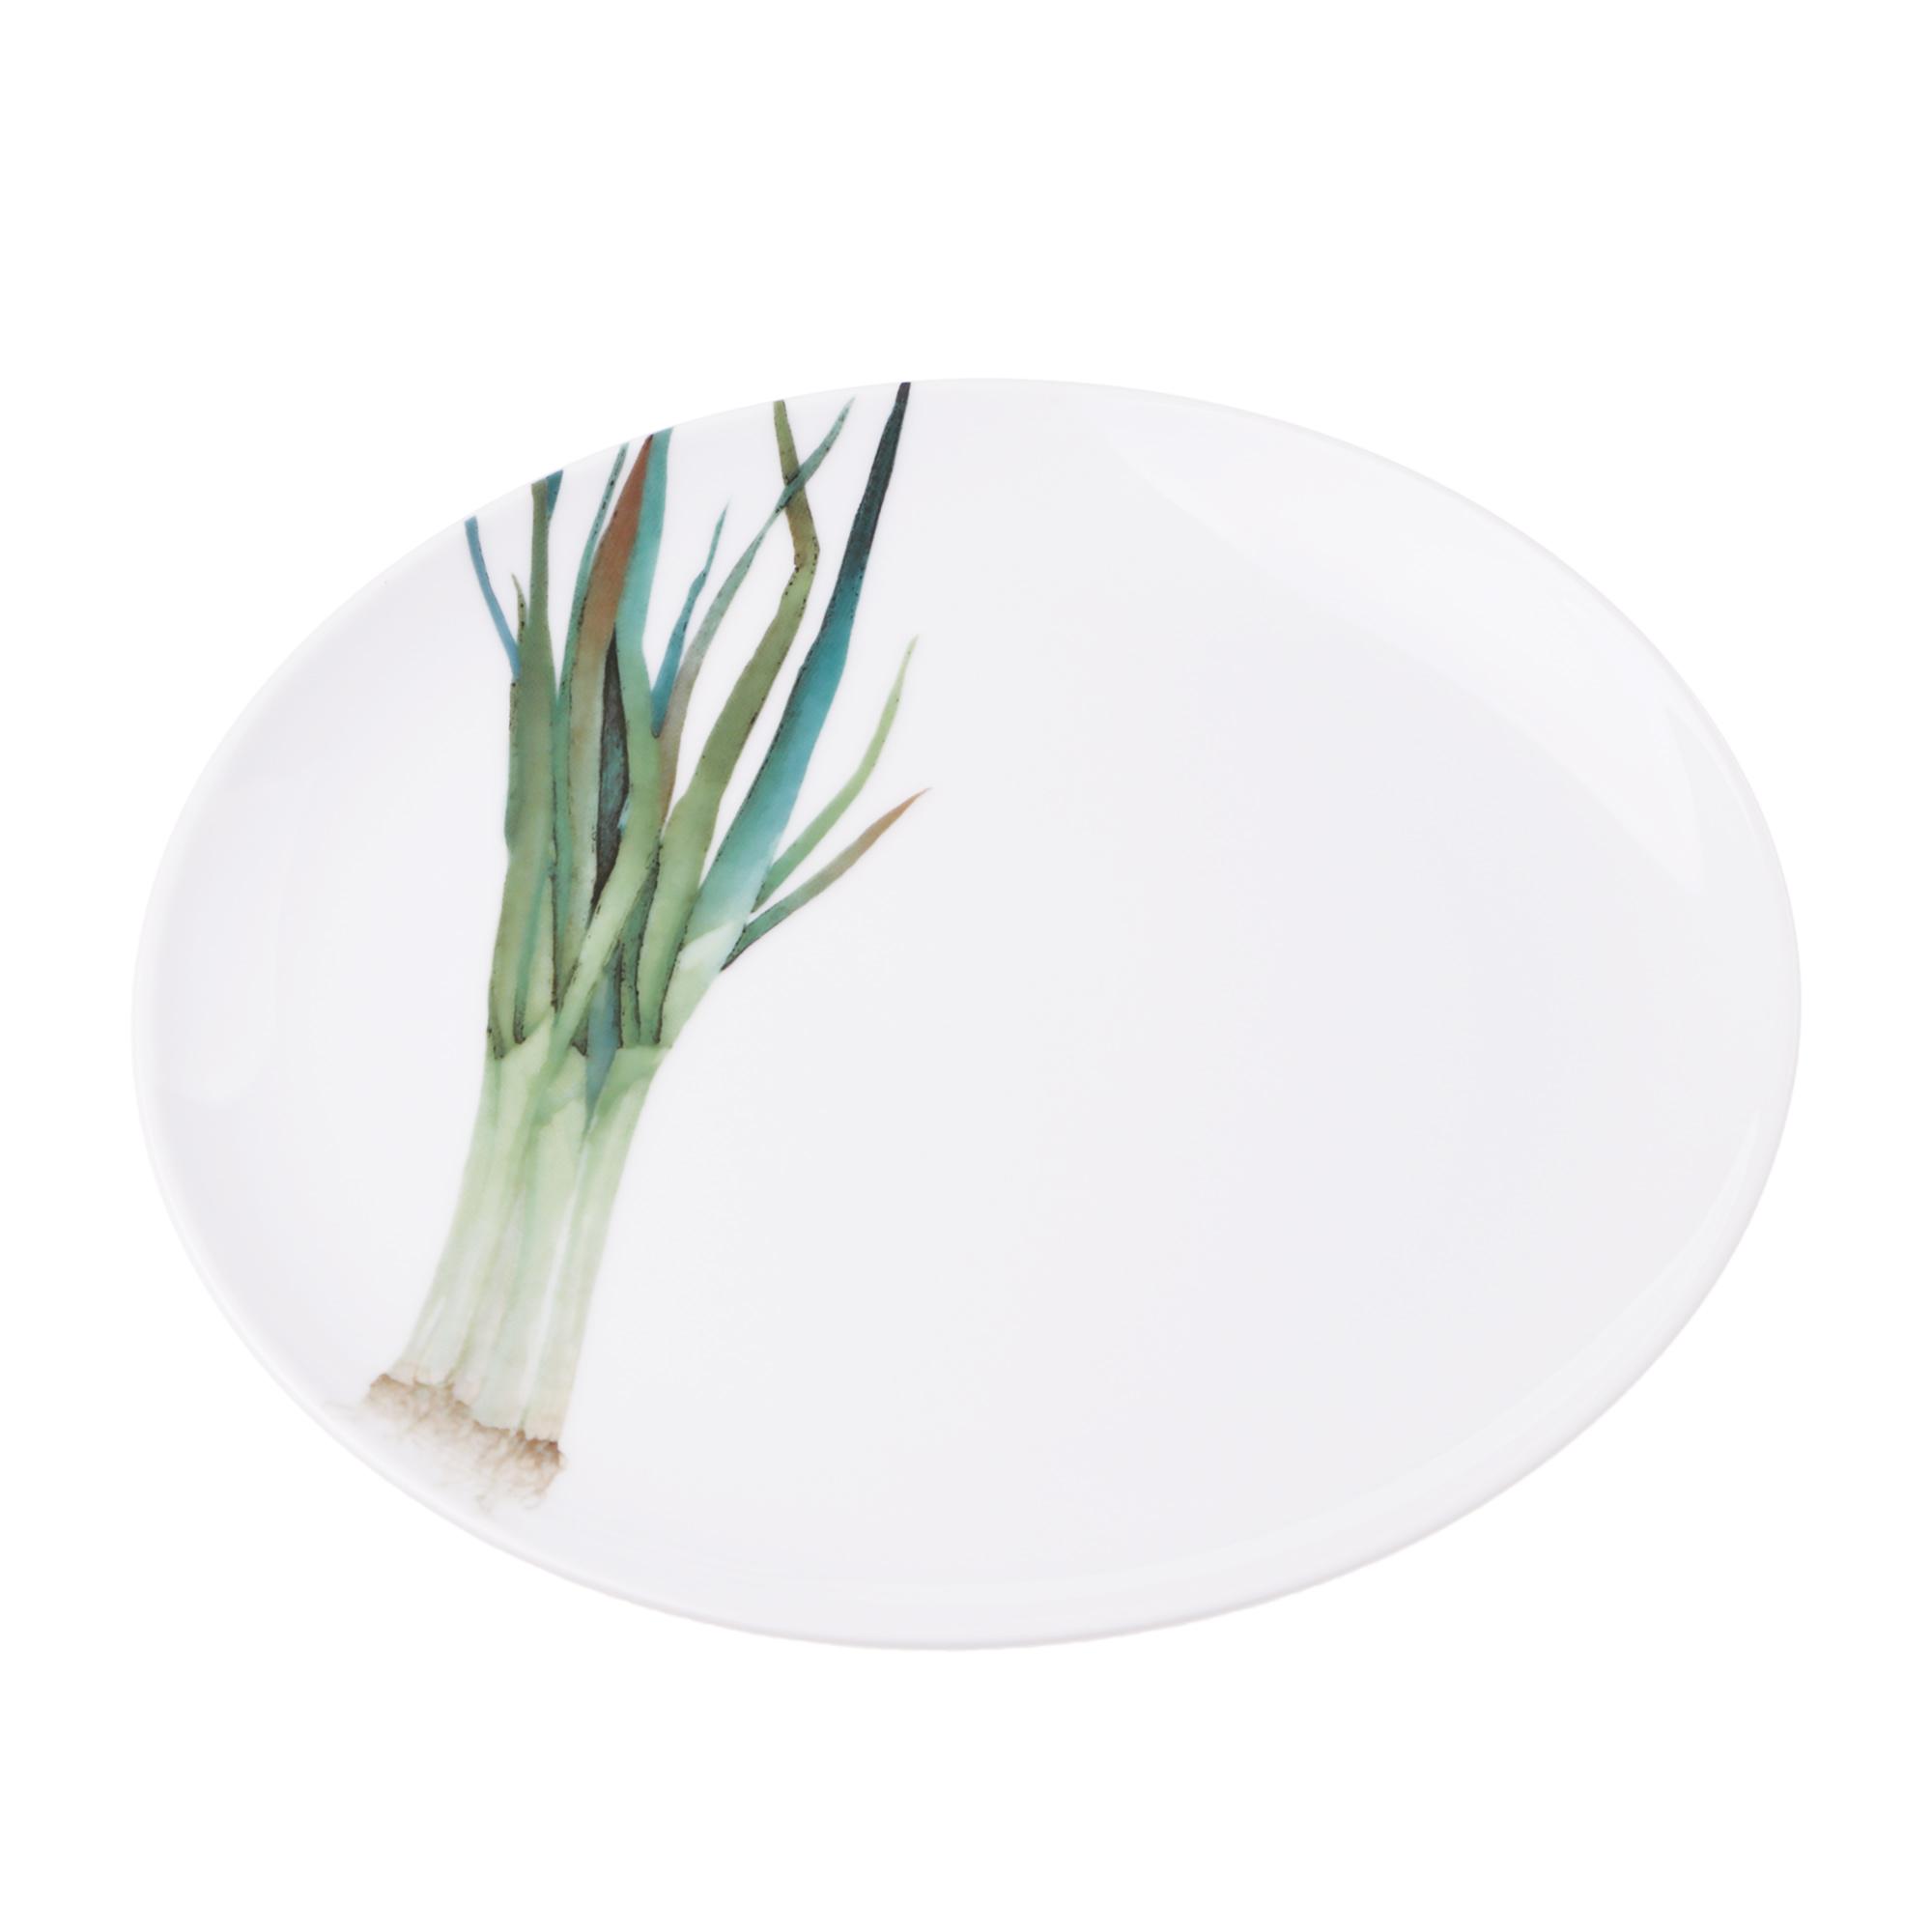 Тарелка закусочная Noritake зеленый лук 24 см тарелка закусочная noritake брум стрит 22см